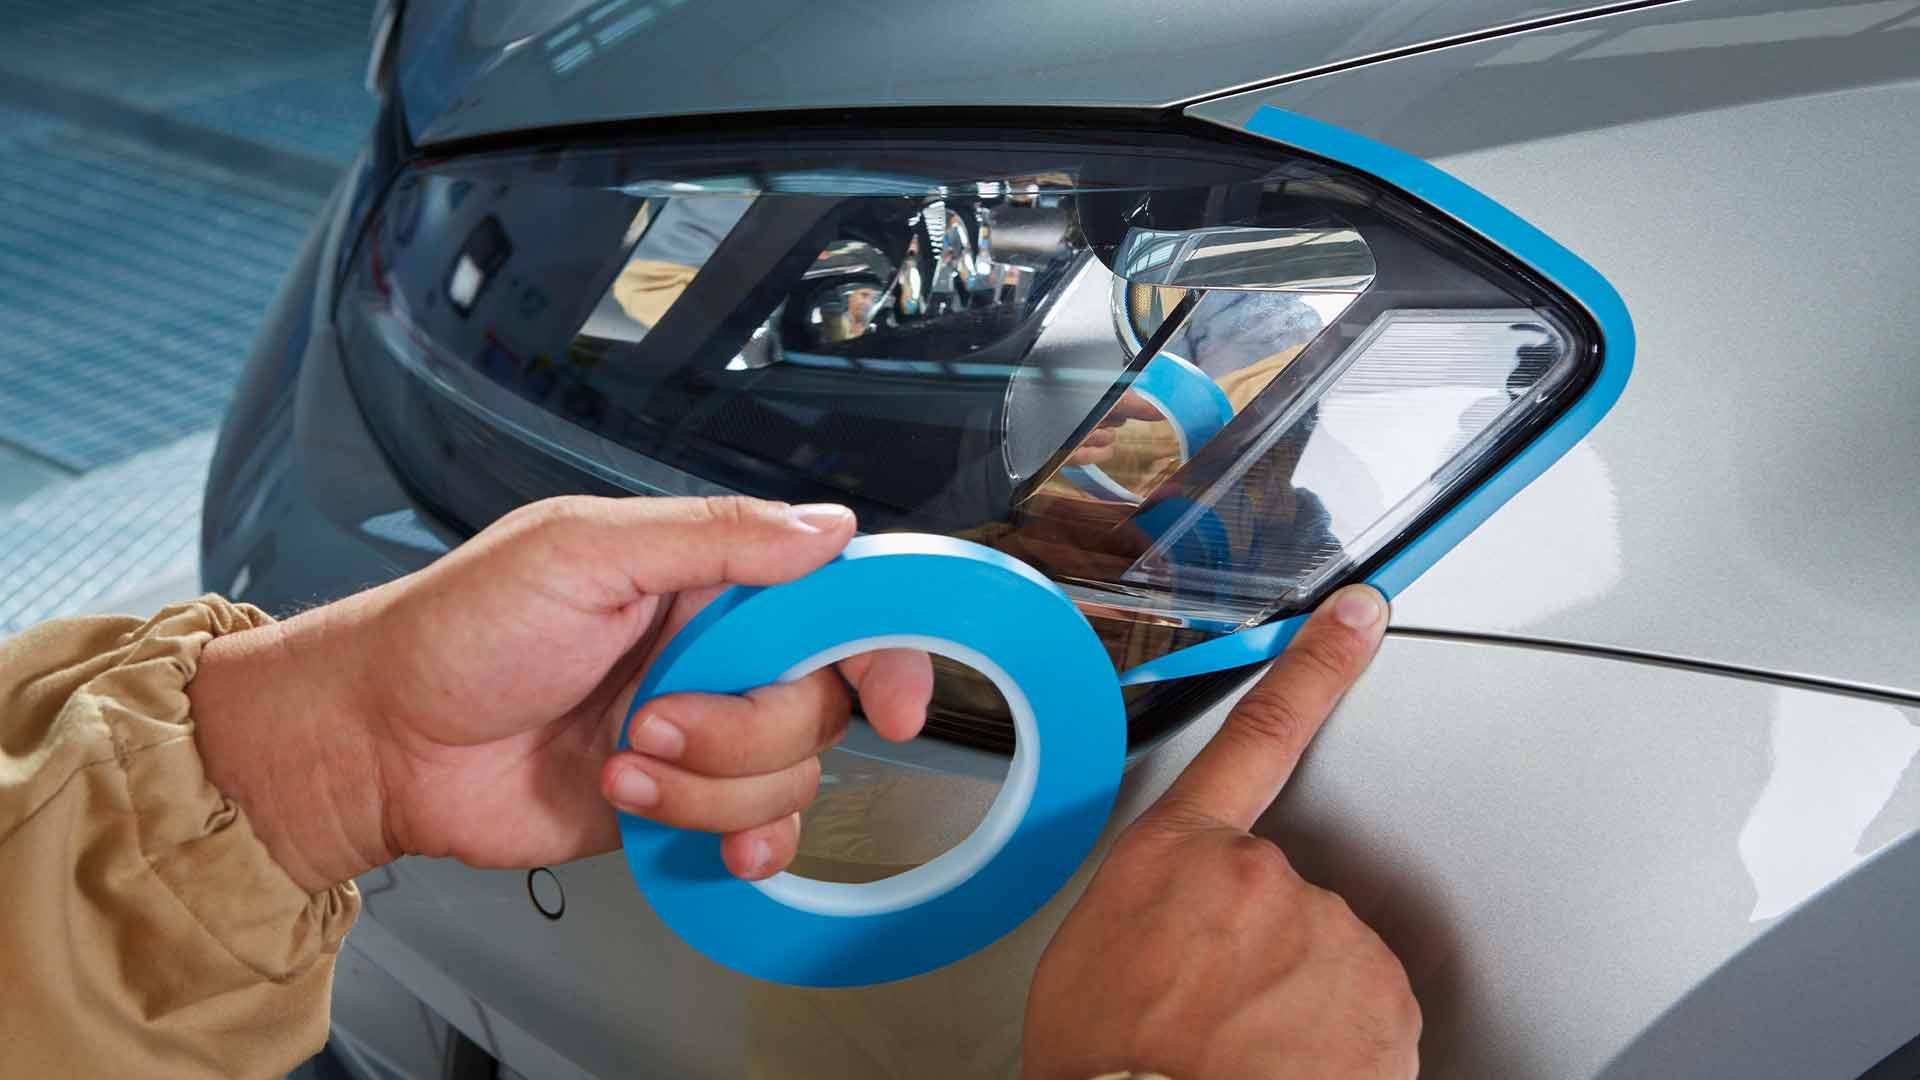 INDASA Abrasives Fine Line Blue Tape applying on car